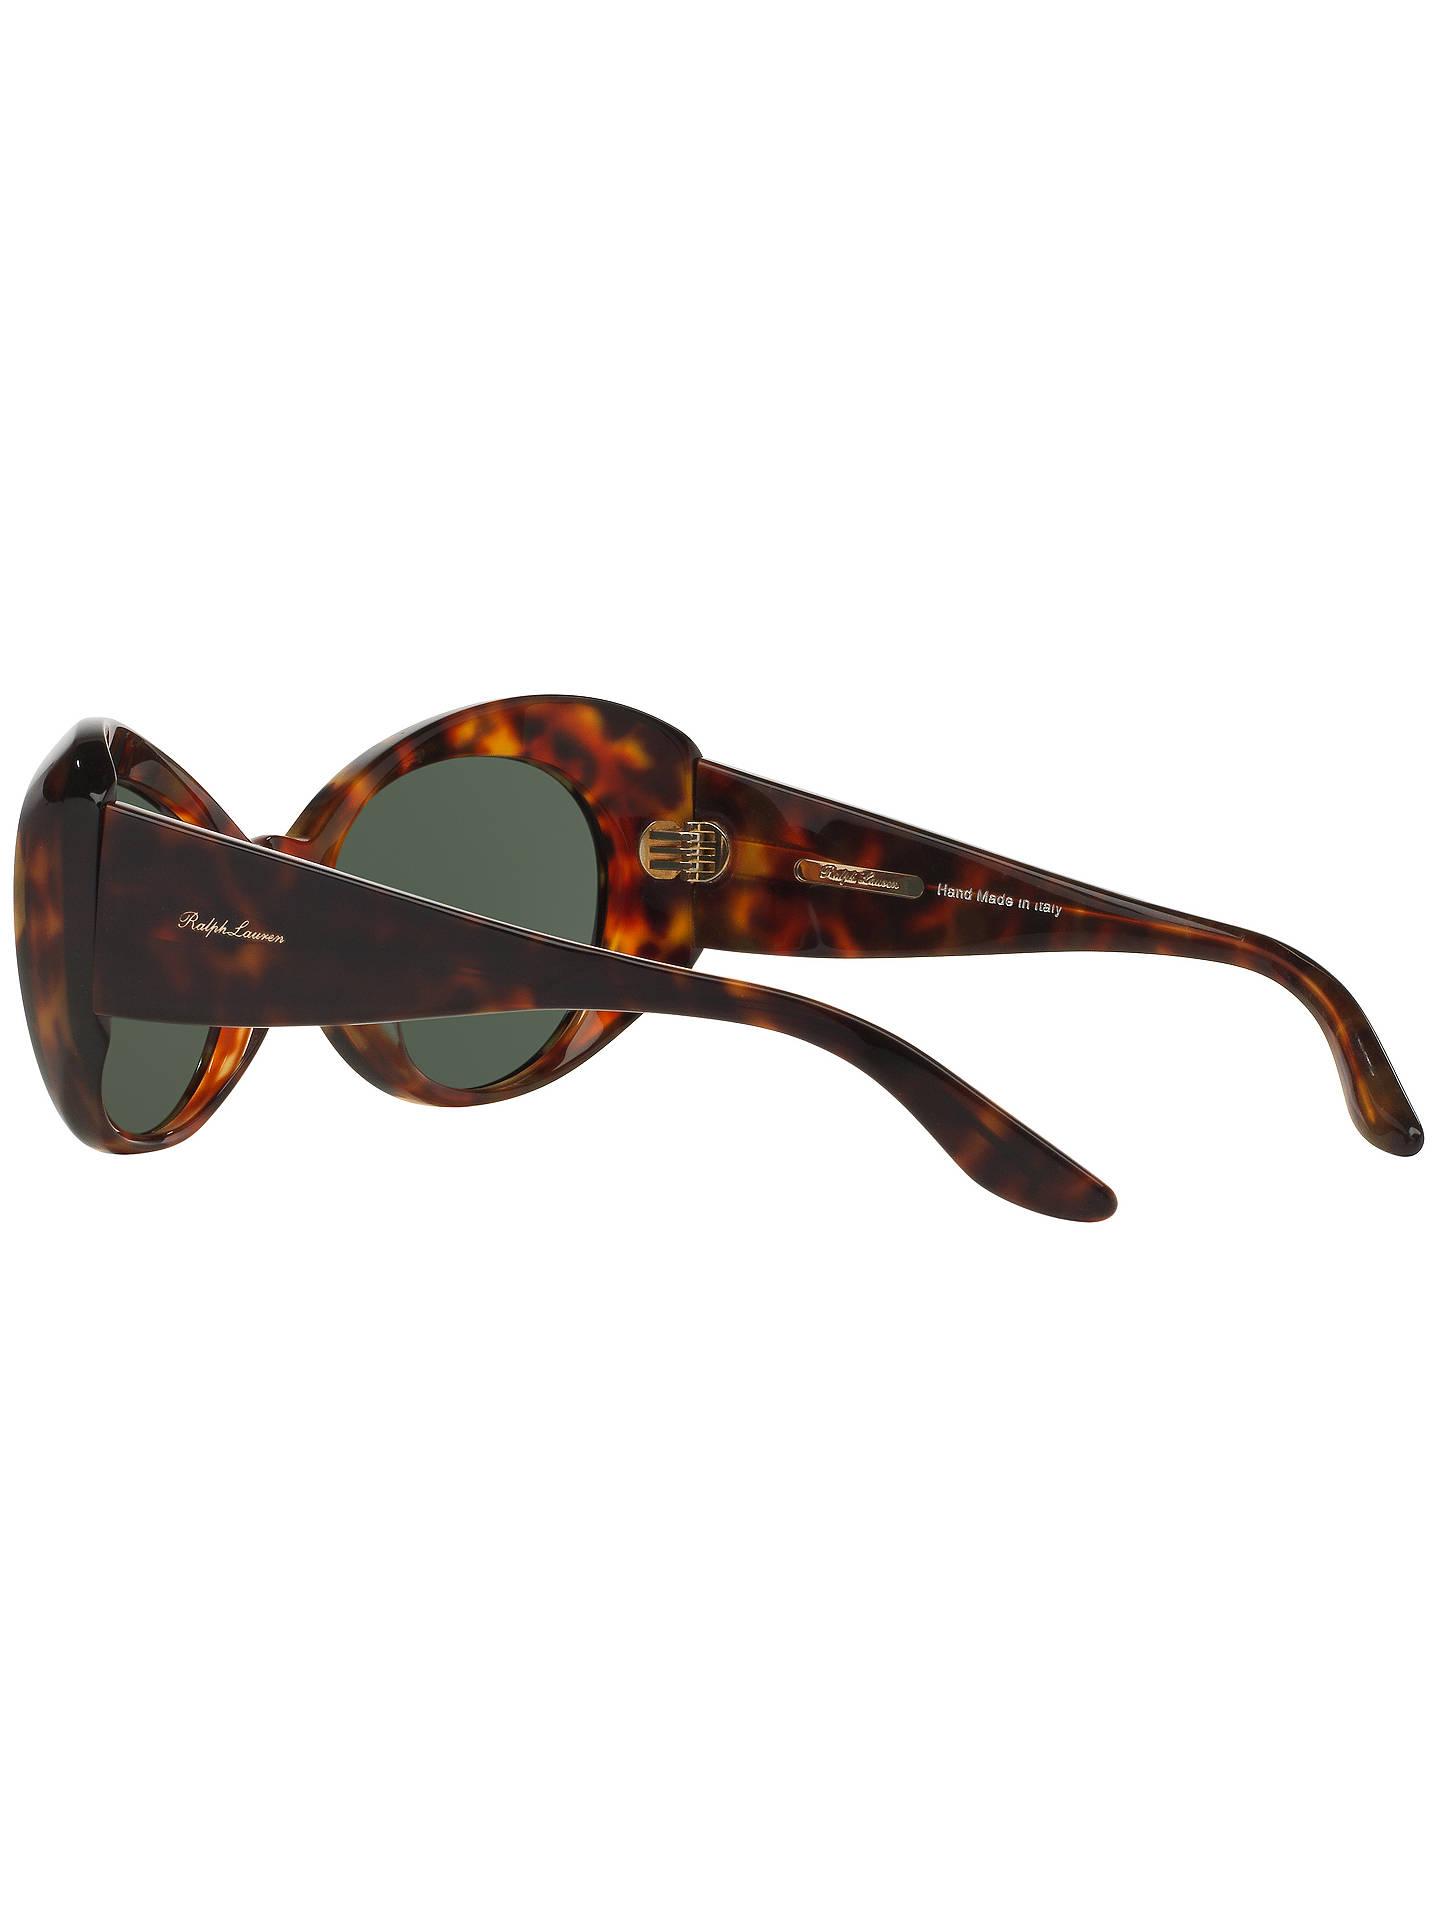 69929bb7bd Ralph Lauren RL8139 Cat s Eye Sunglasses at John Lewis   Partners